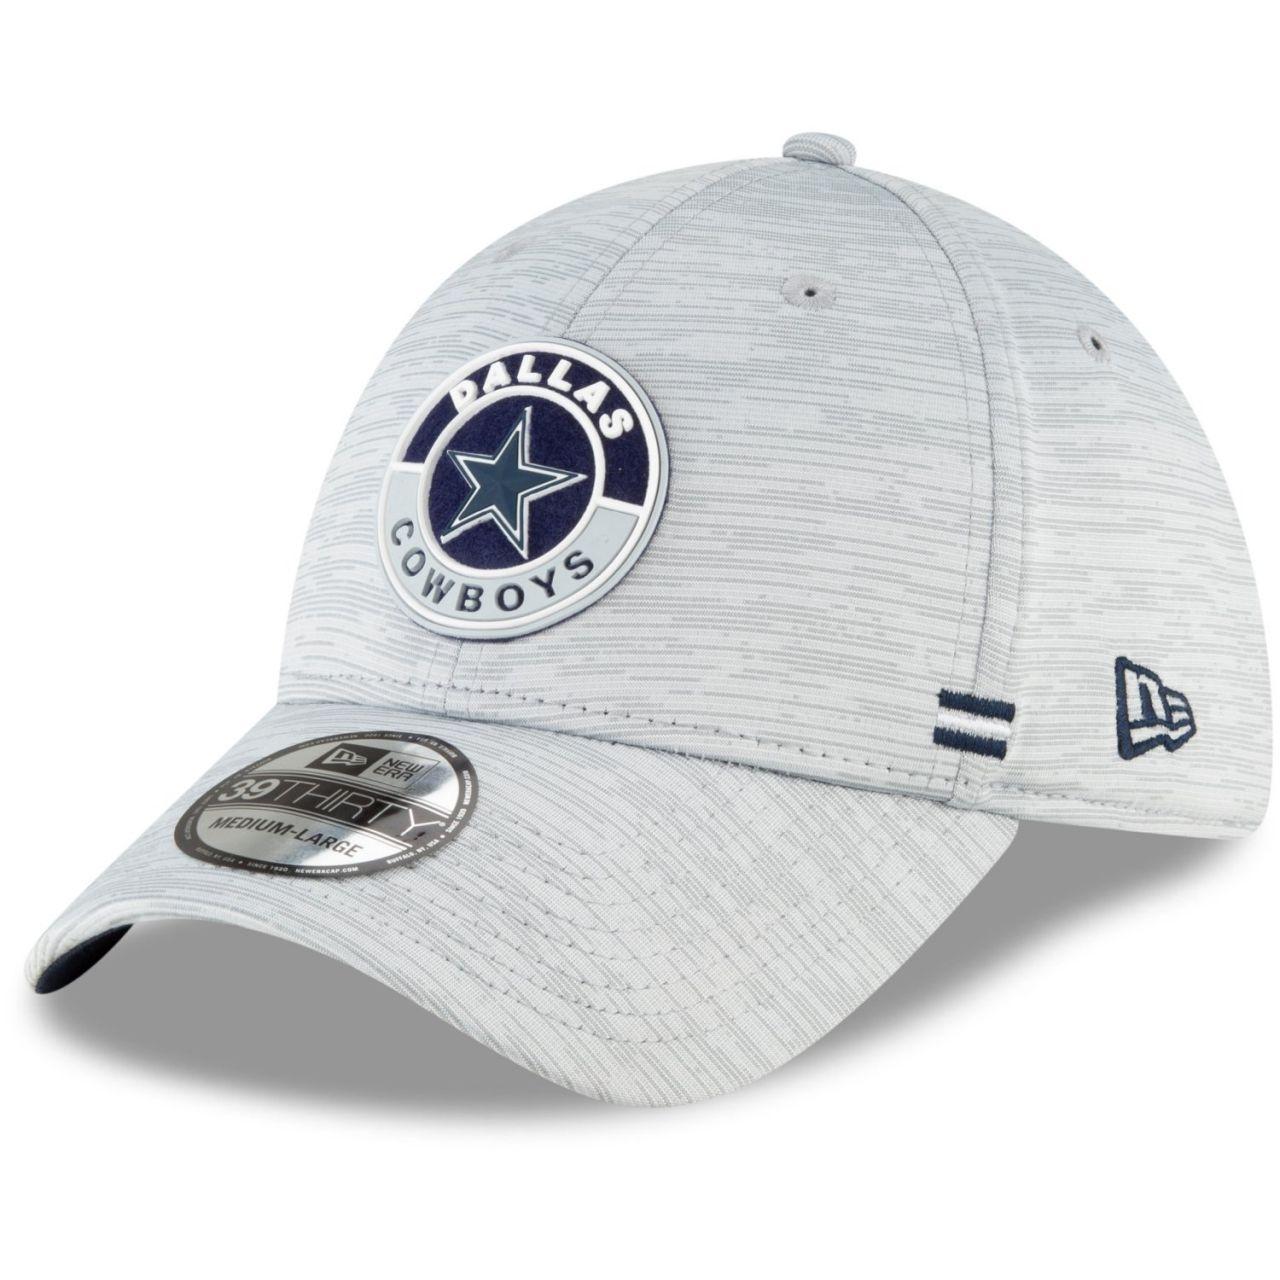 amfoo - New Era 39Thirty Cap - SIDELINE 2020 Dallas Cowboys